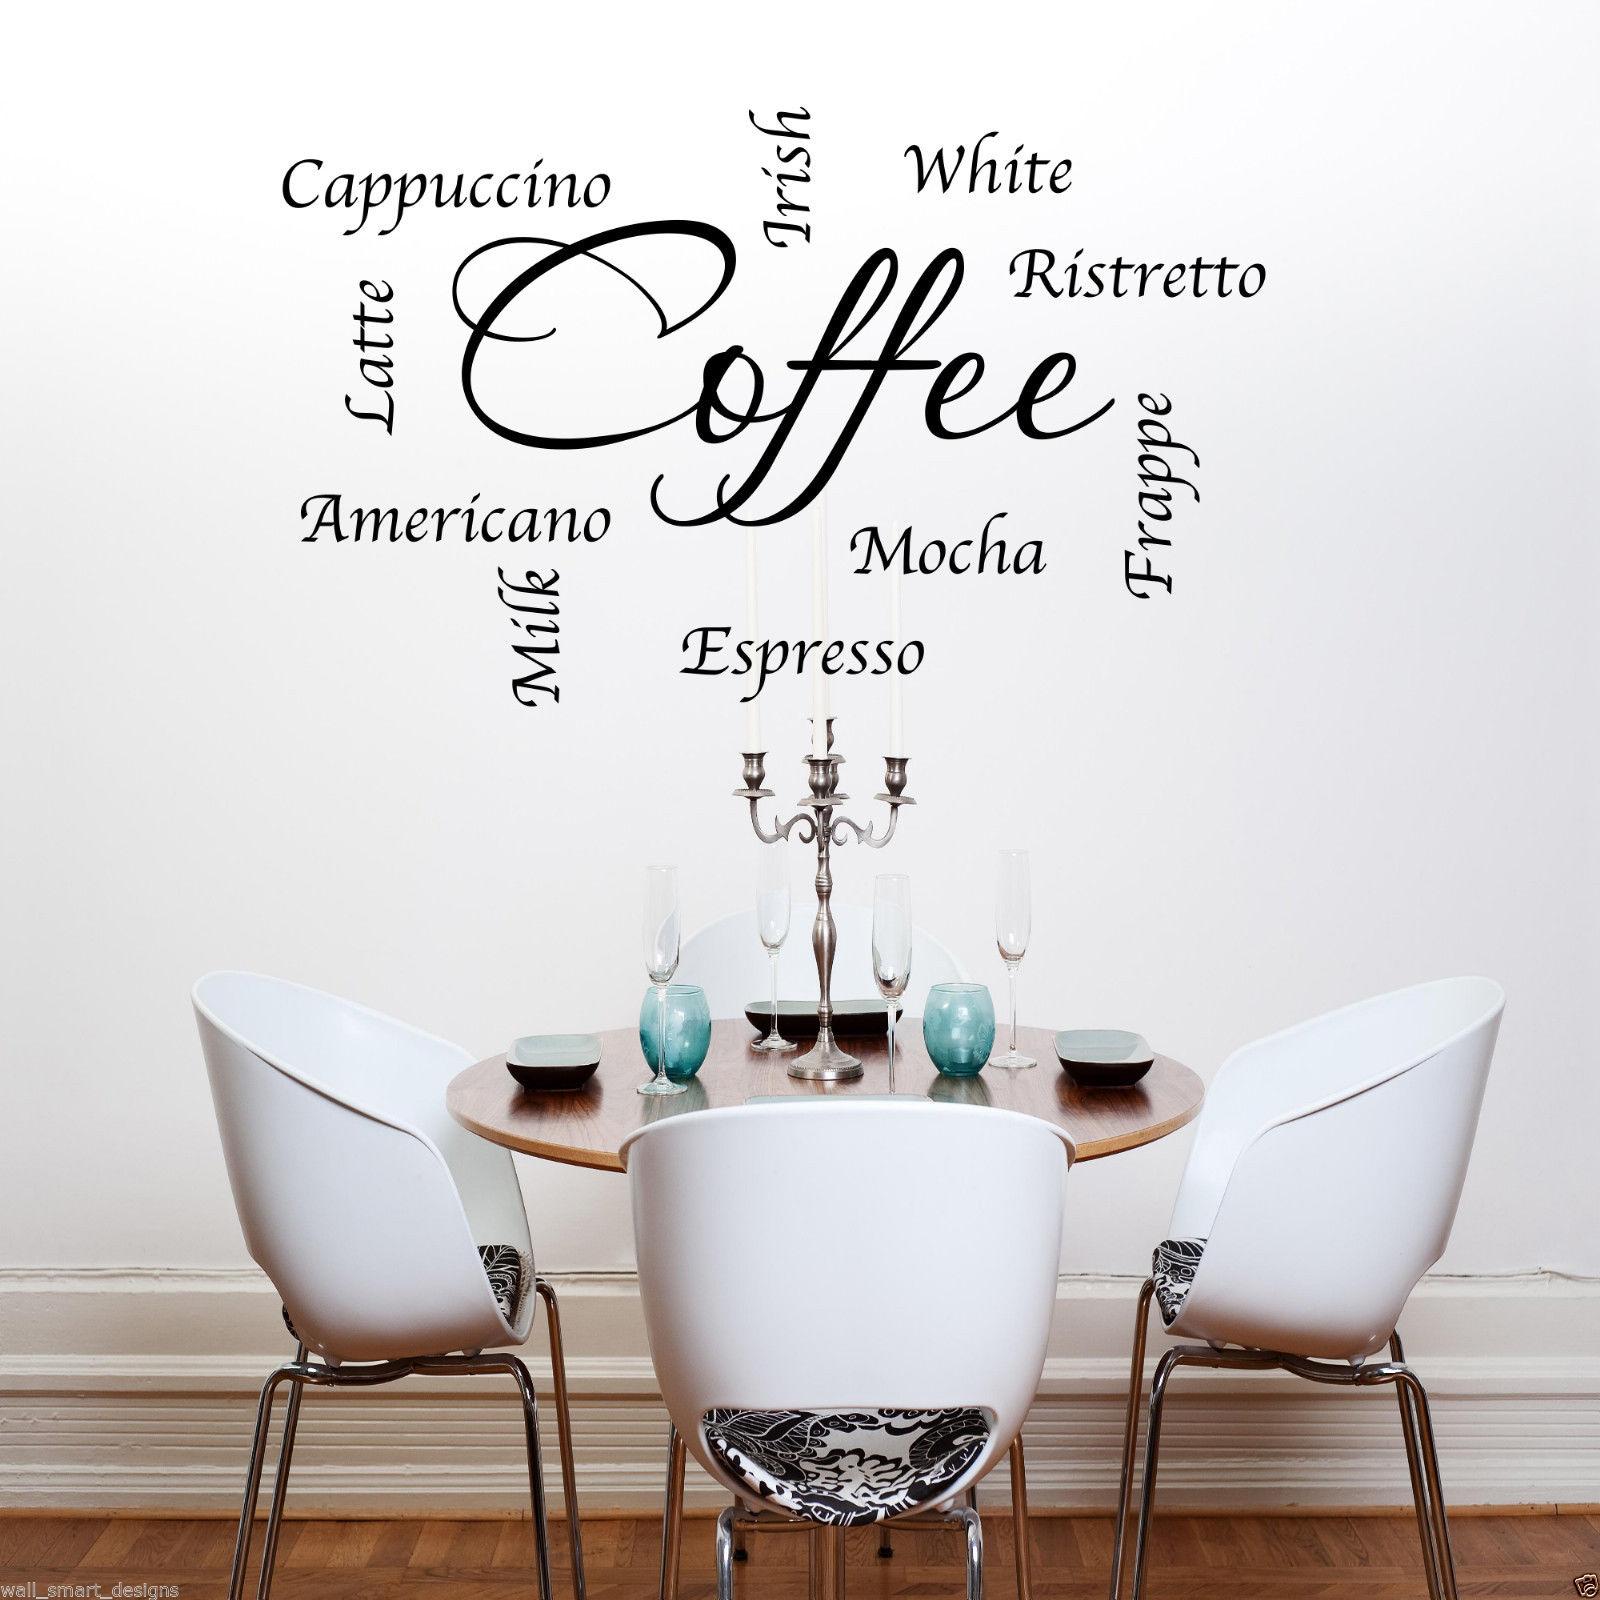 Caff parole frasi cucina adesivo artistico da parete for Murales per cucina